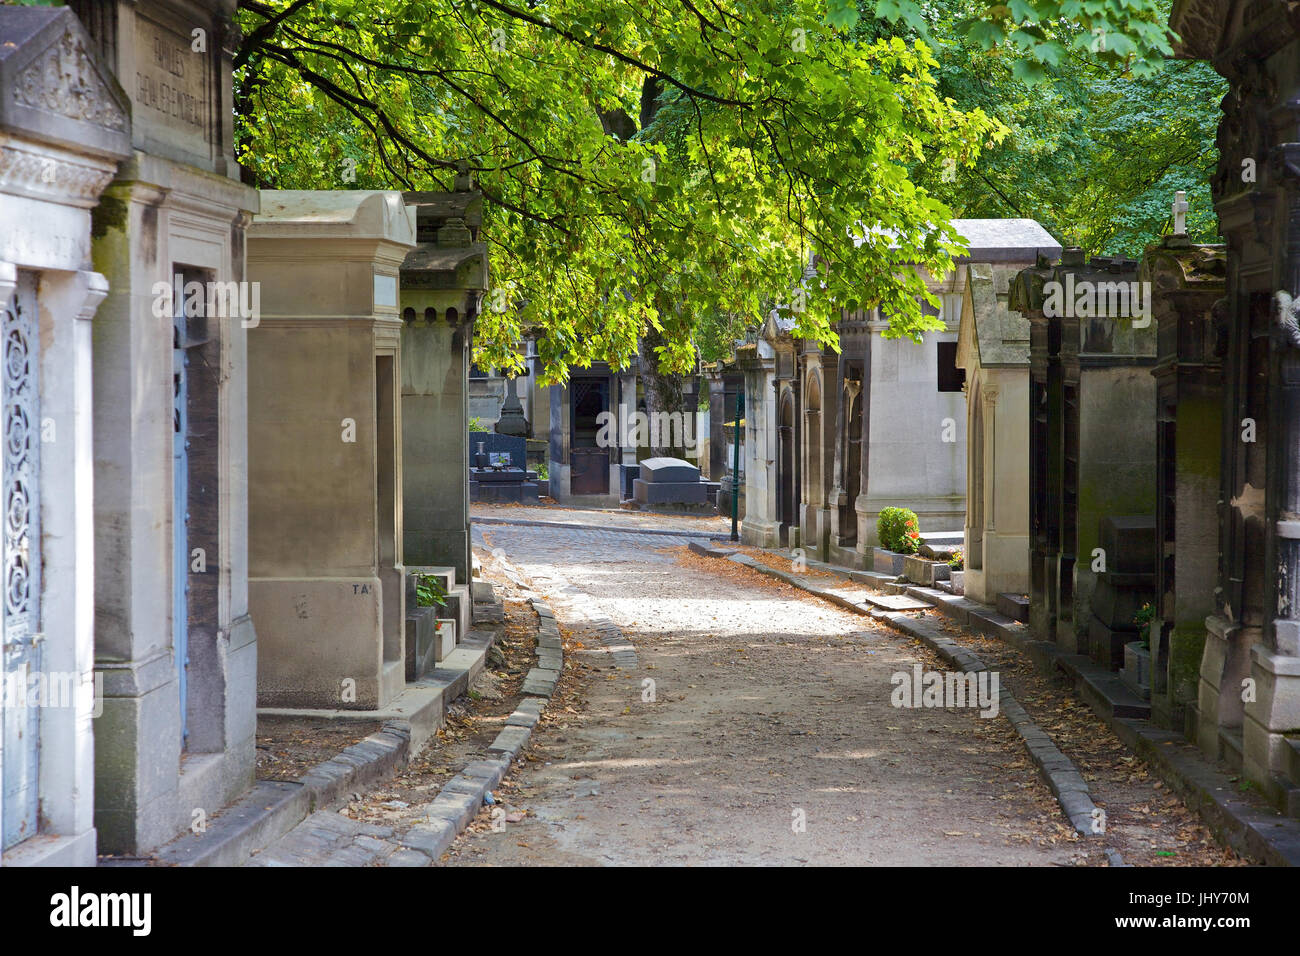 Cemetery Pere Lachaise, Paris, France - Cemetery Pere Lachaise, Paris, France, Friedhof Pere Lachaise, Frankreich - Cemetery Pere Lachaise Stock Photo